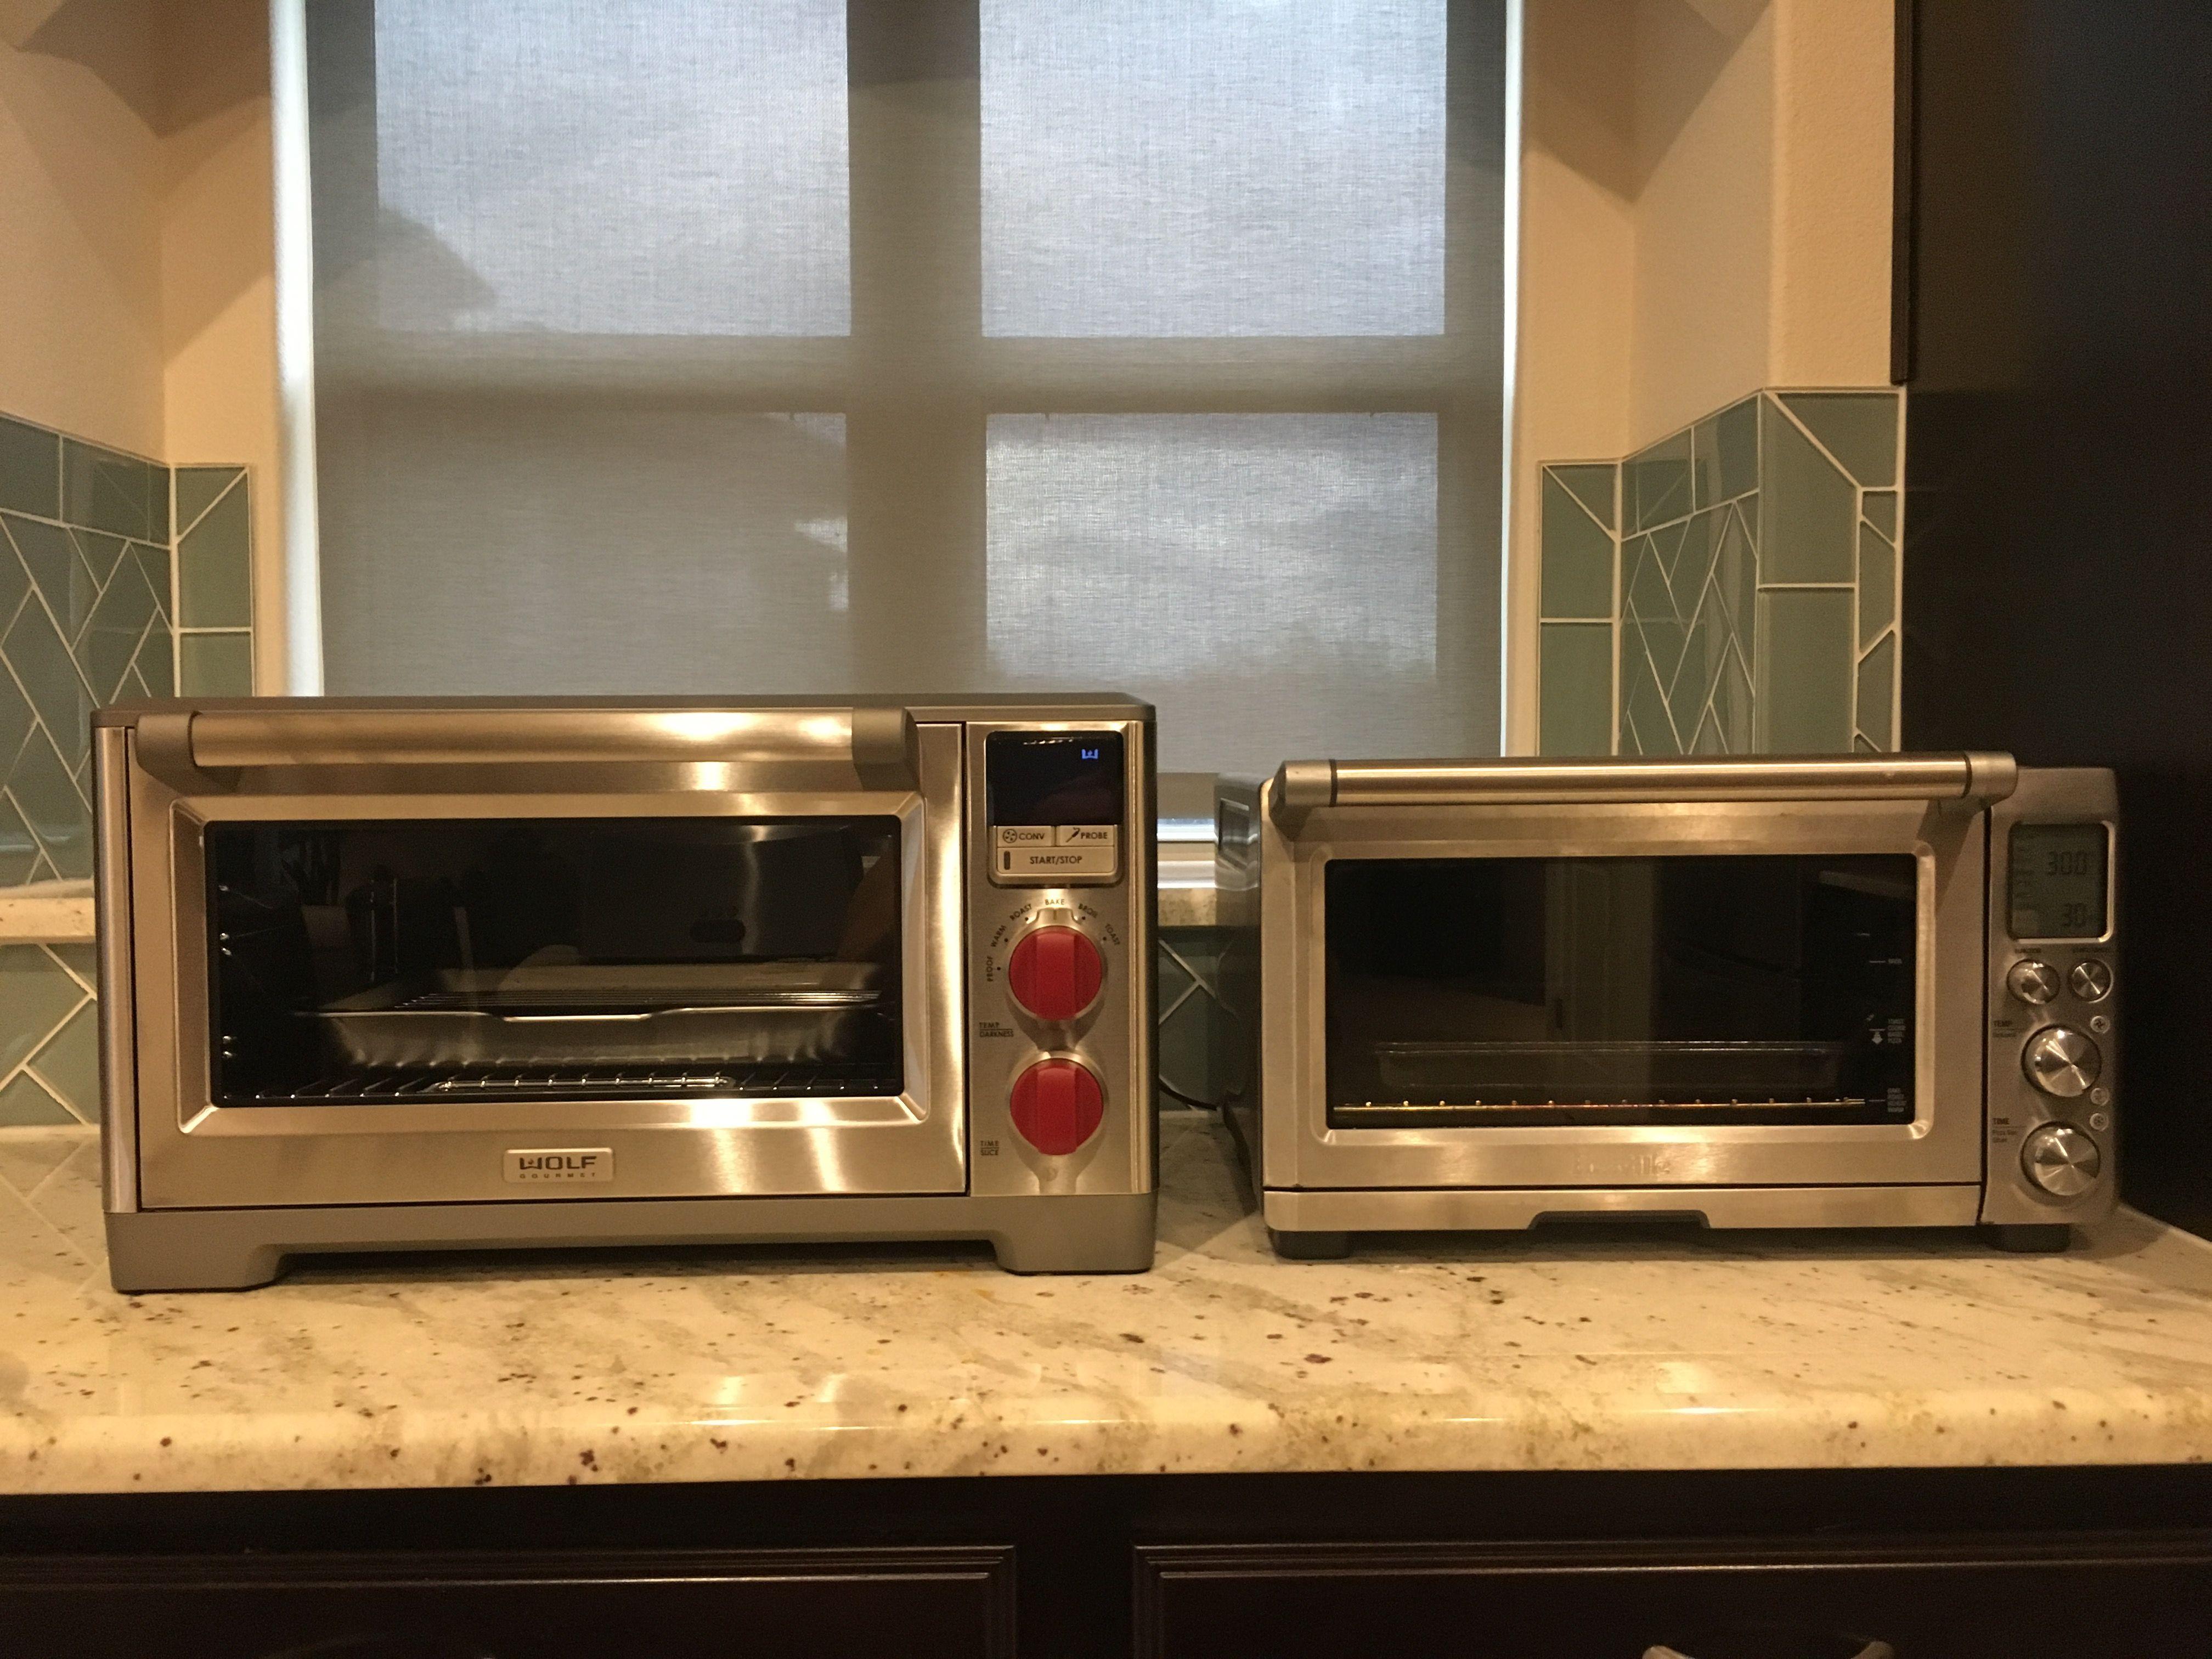 Wolf Countertop Oven Vs Breville Smart Oven Countertop Oven